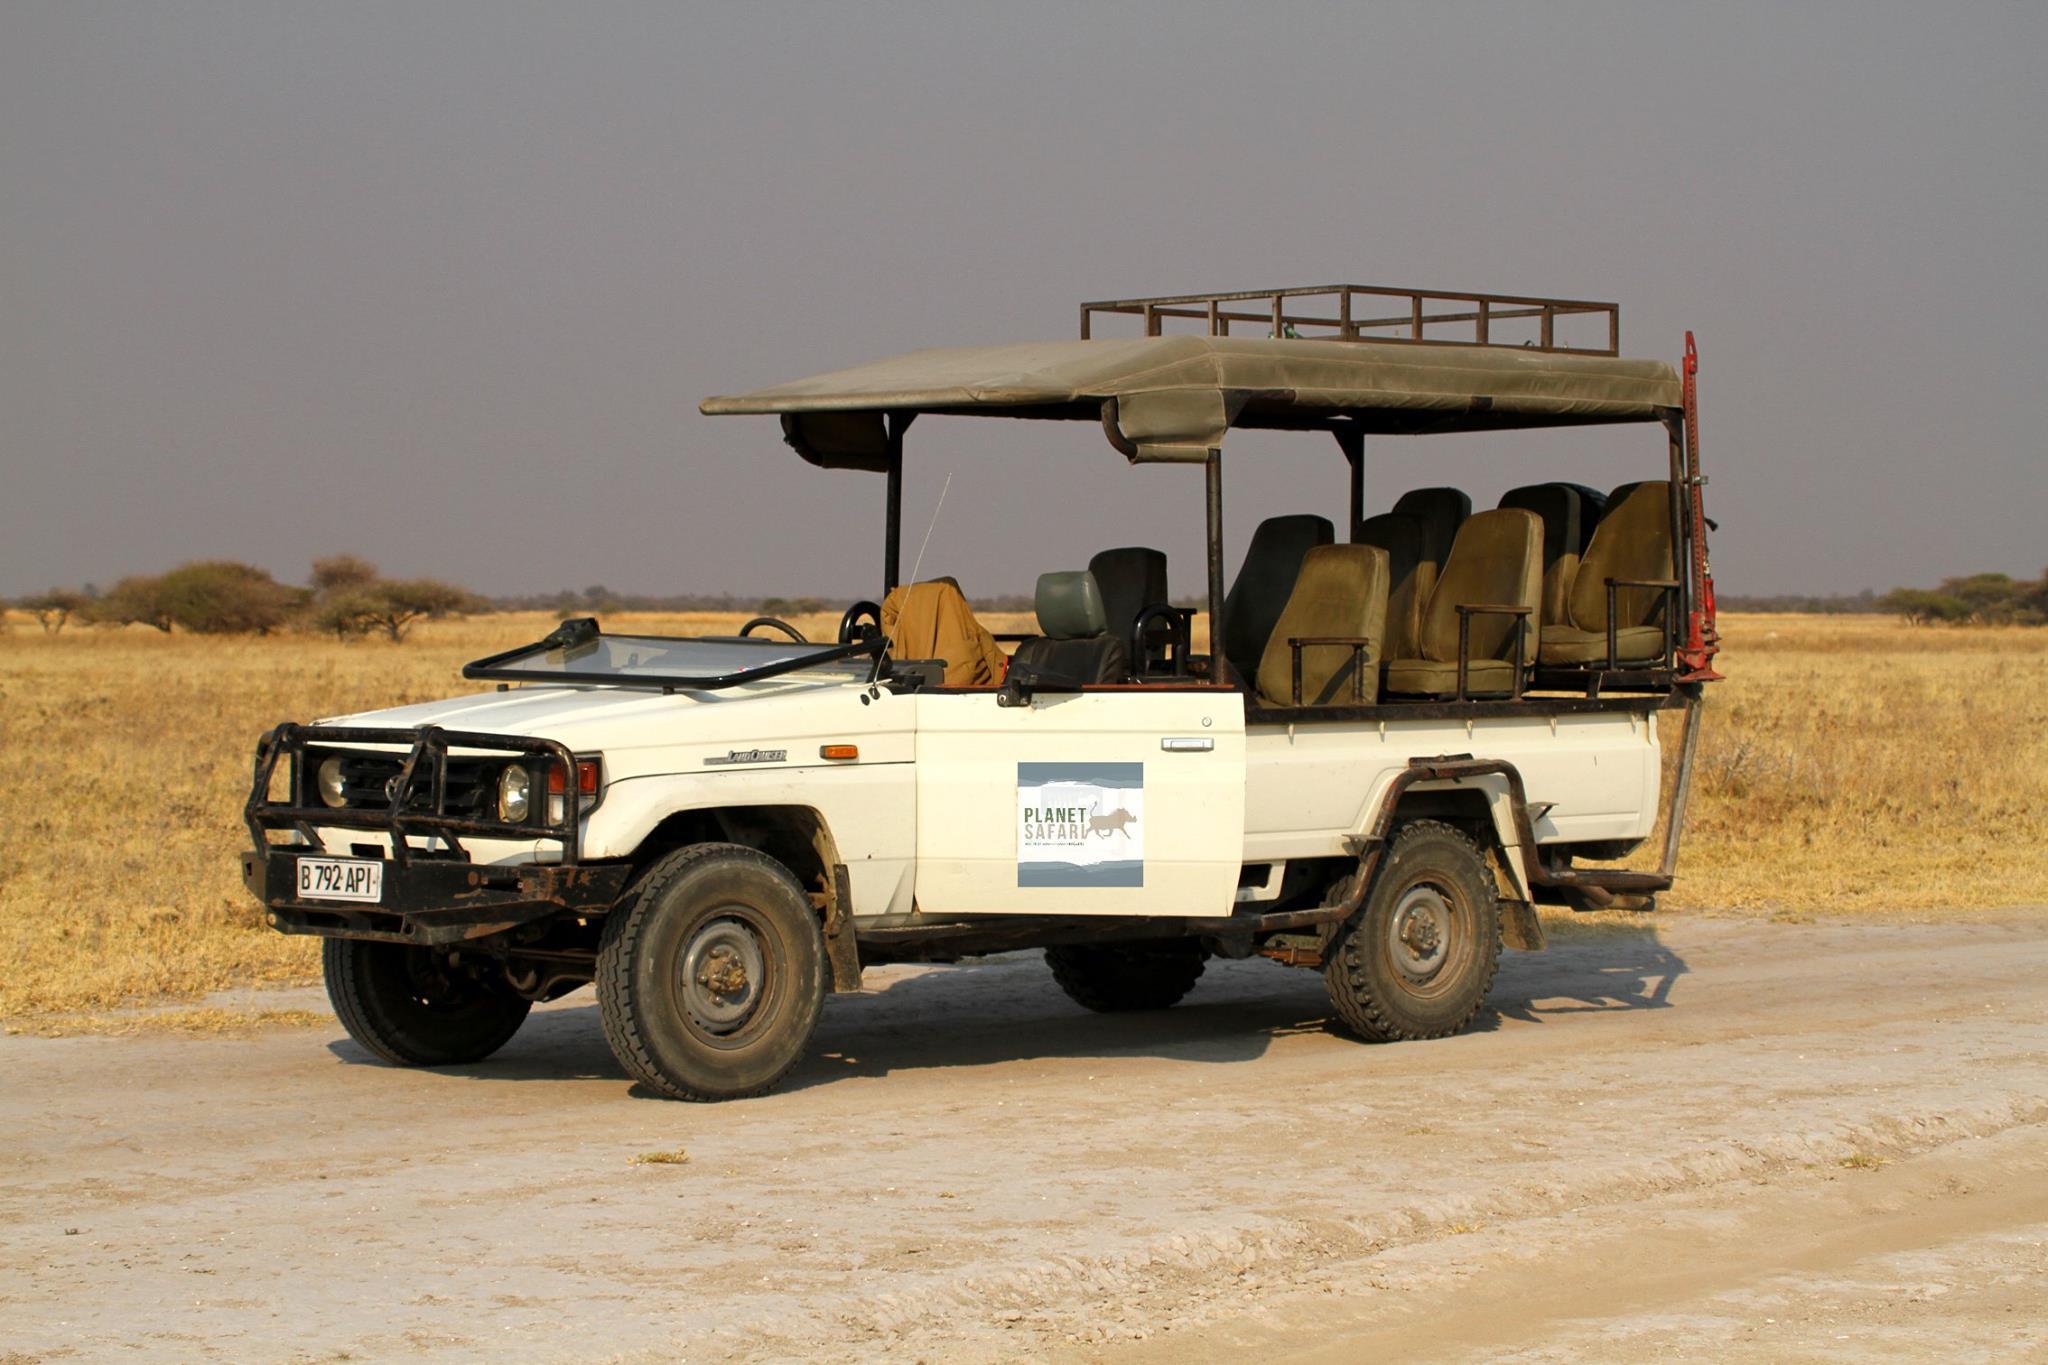 Planet Safari Vehicle